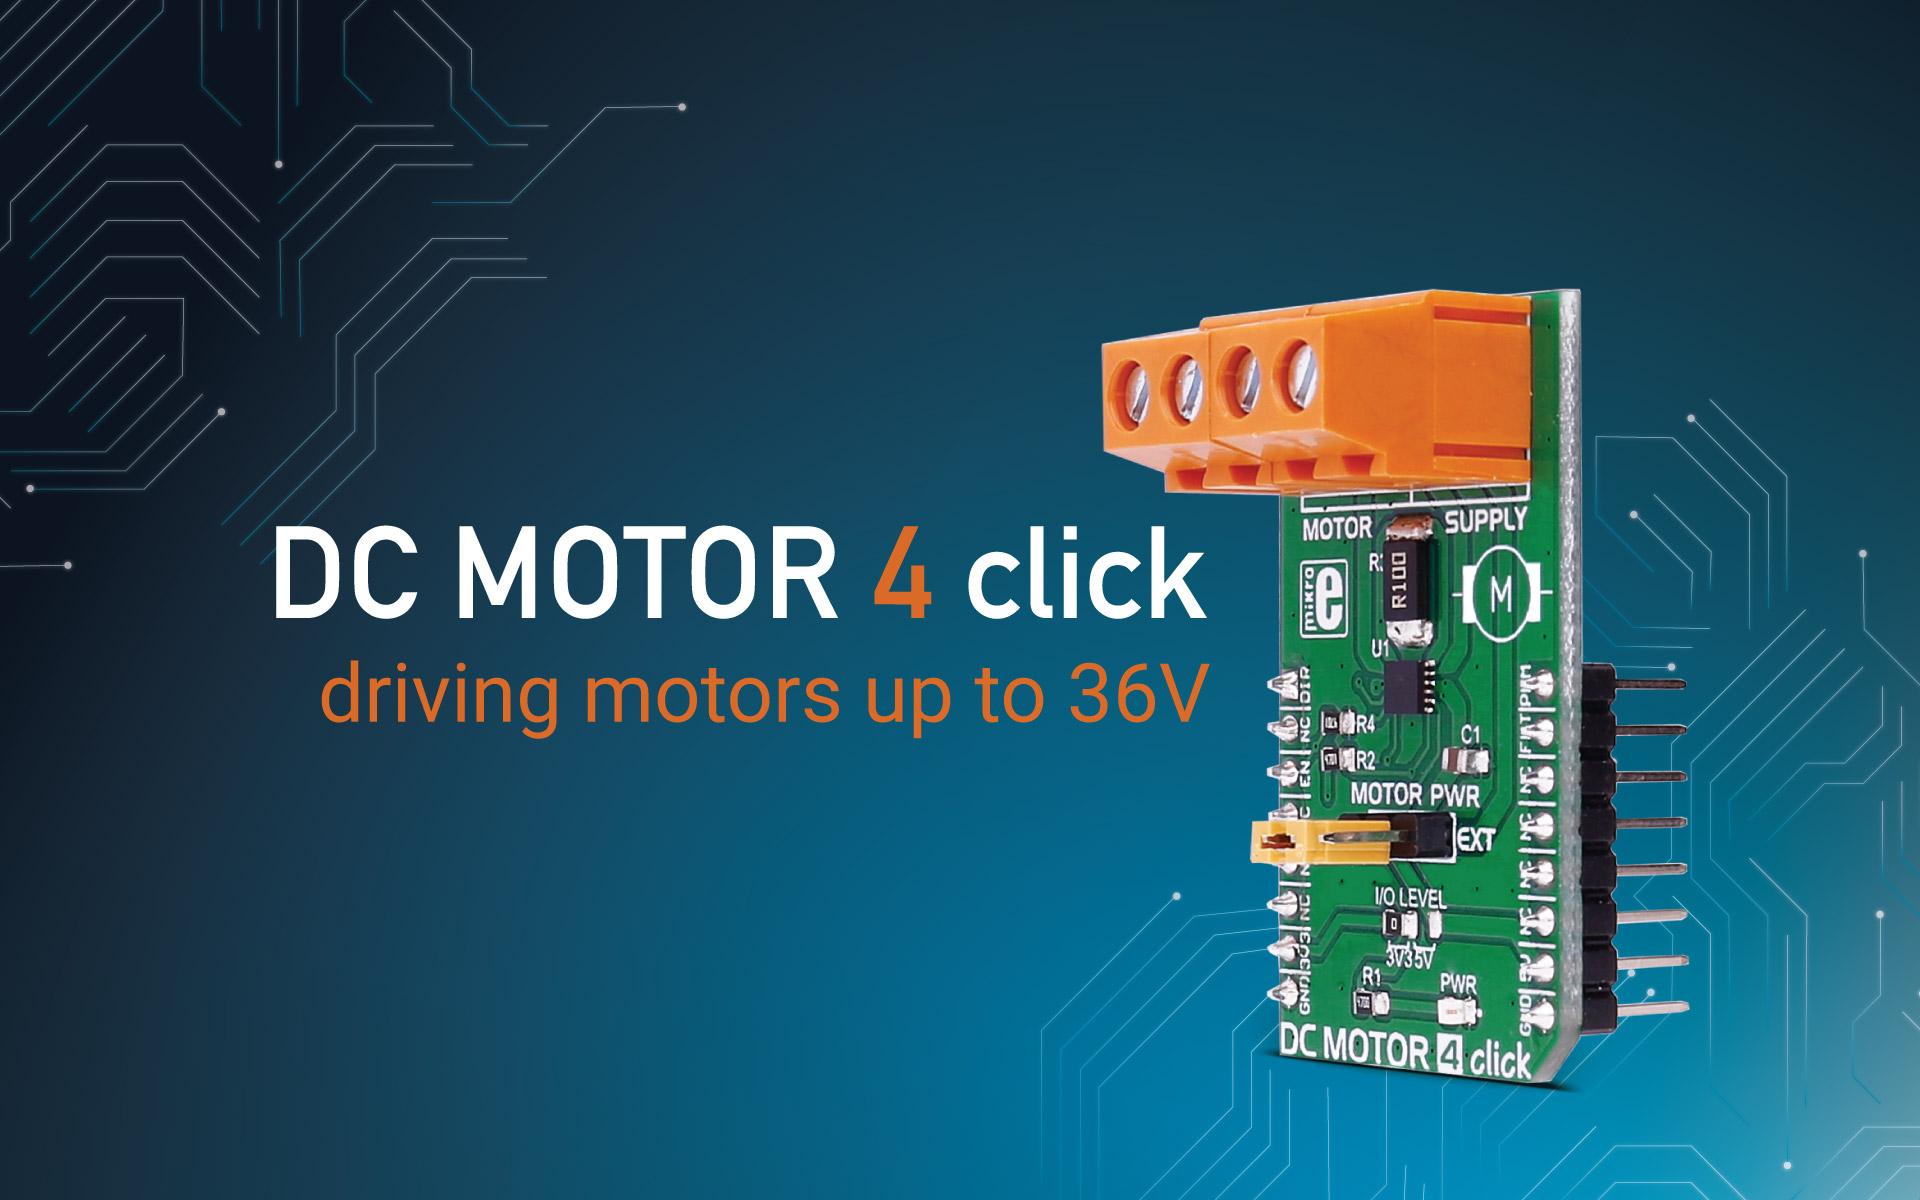 DC MOTOR 4 click - driving motors up to 36V